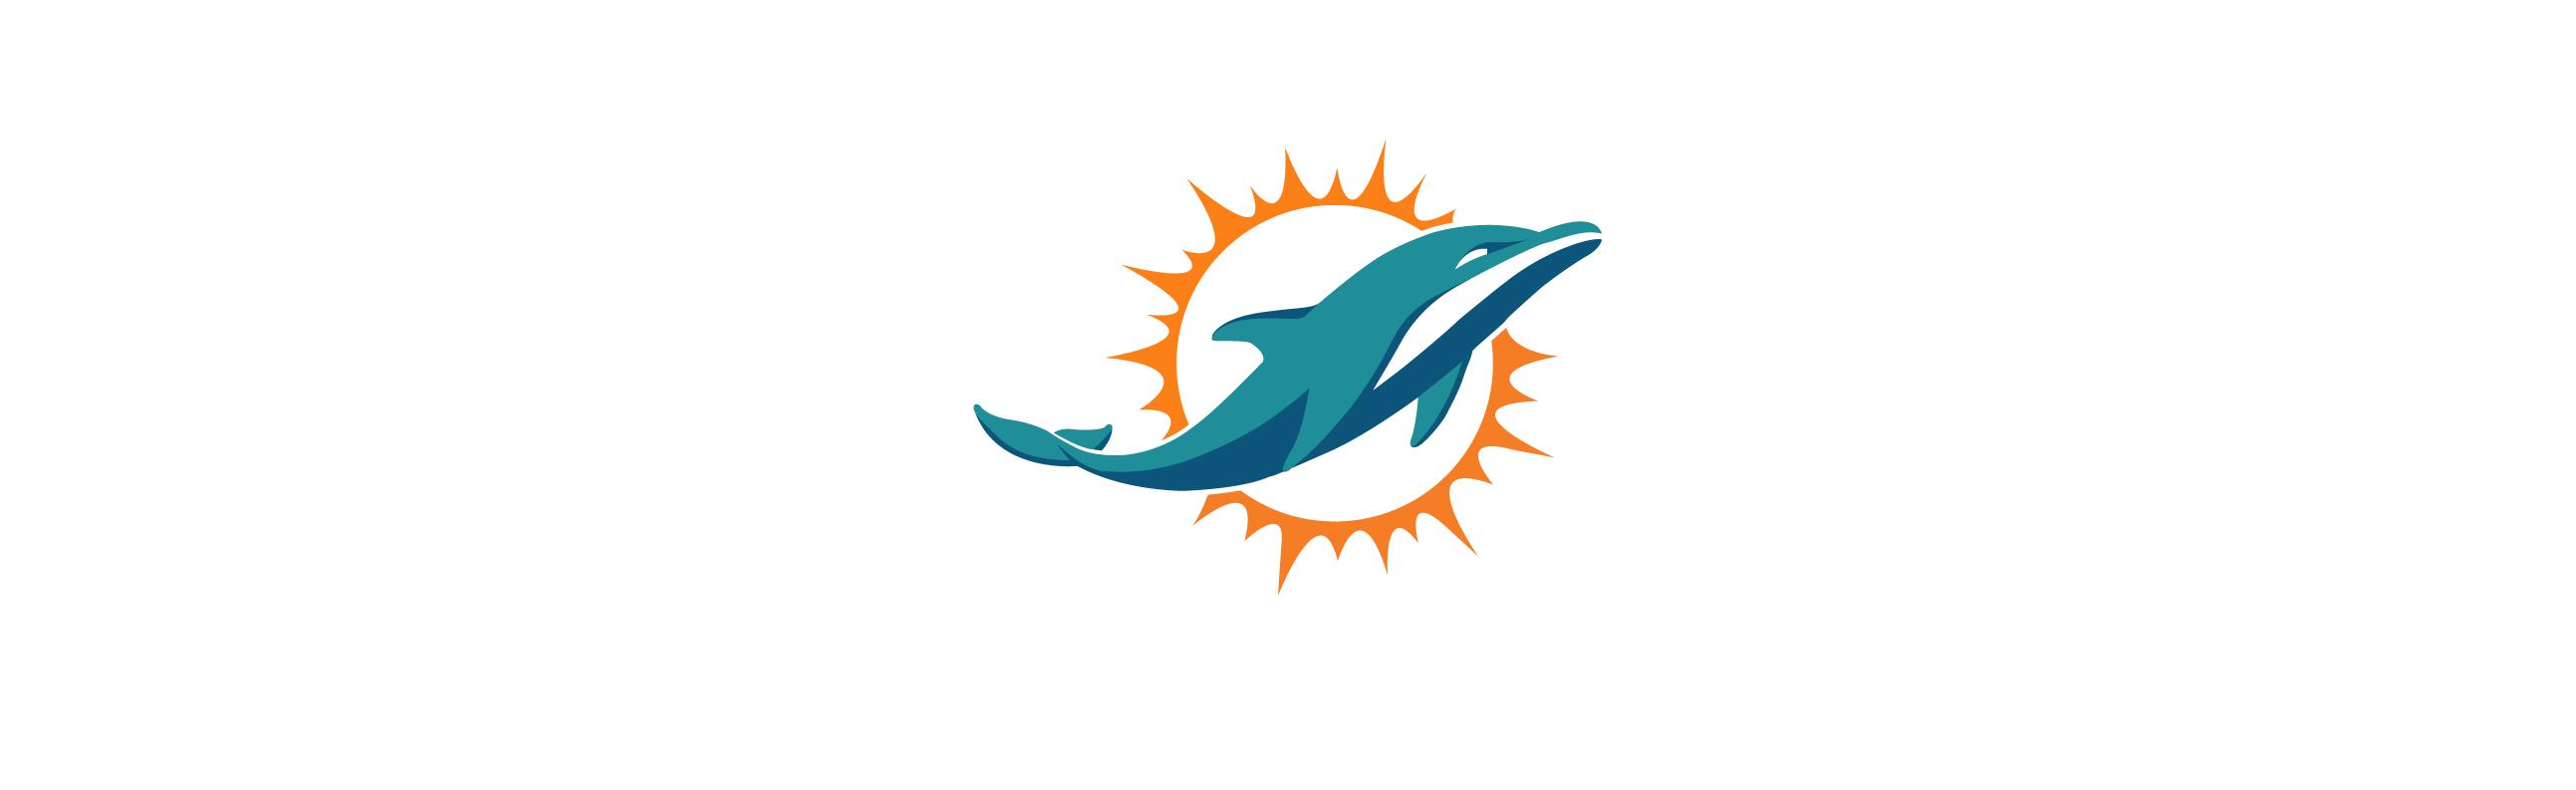 Miami Dolphins Design Practice - Tito Goldstein